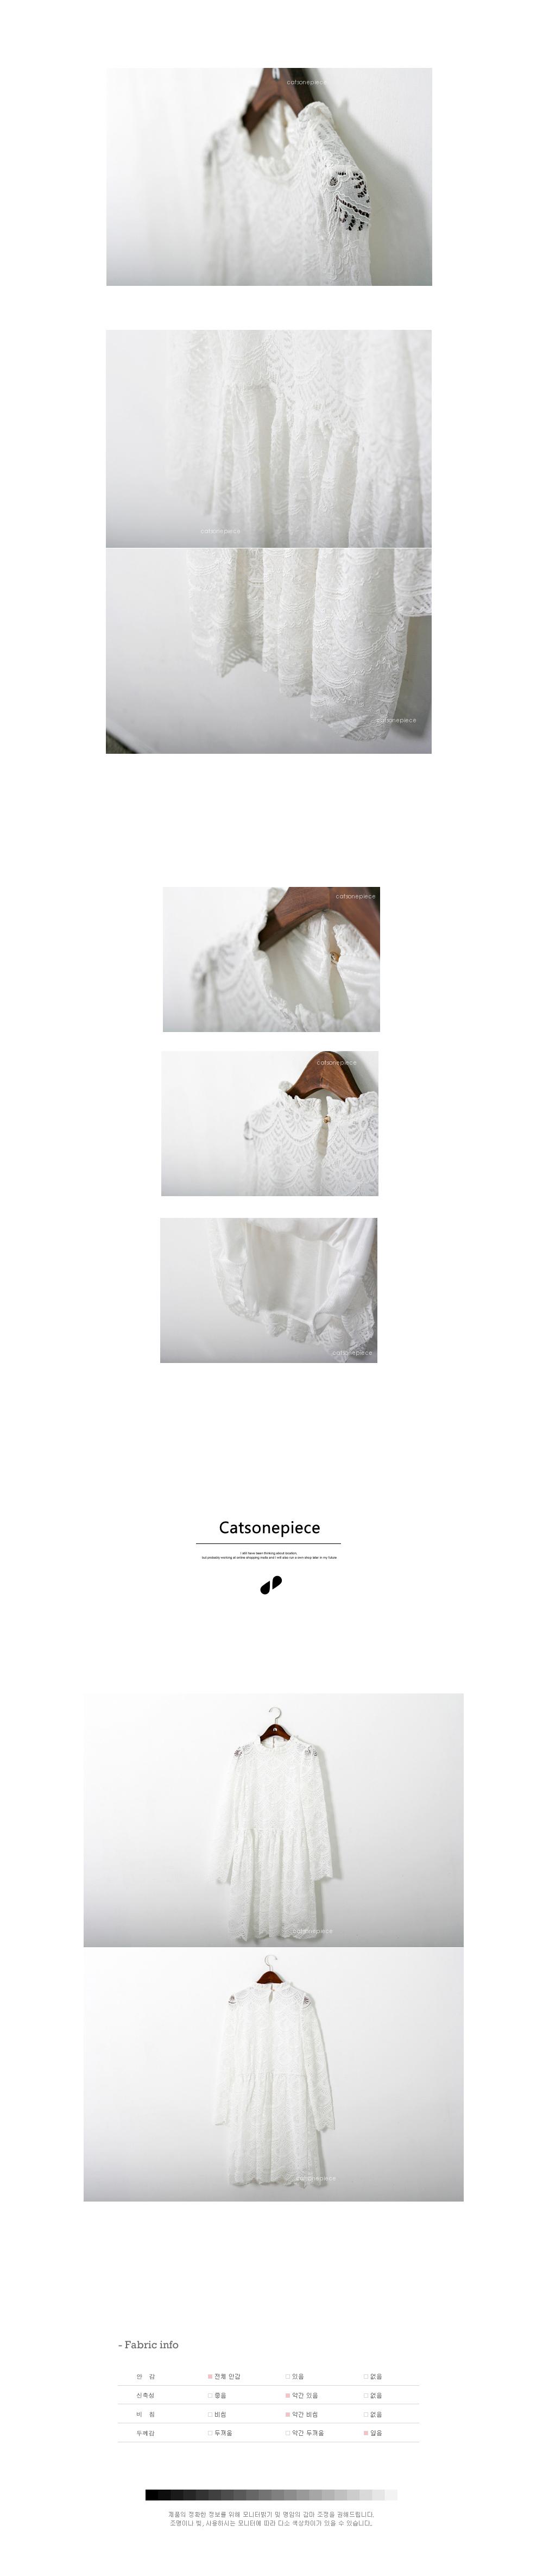 See-through ruffle lace dress